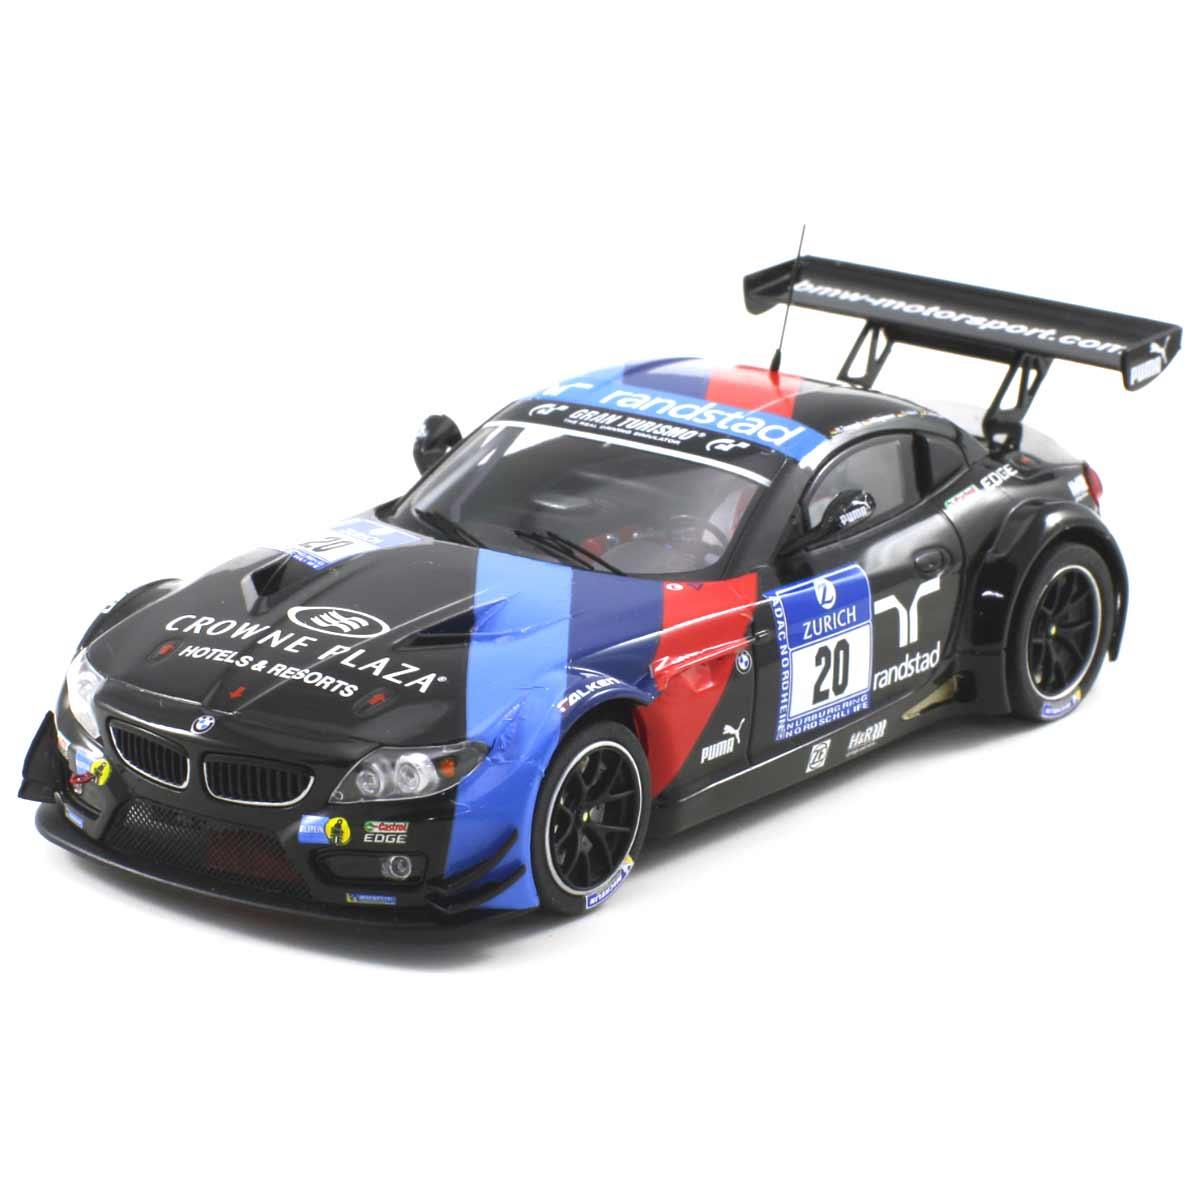 Bmw Z4 Gt3: Scaleauto BMW Z4 GT3 No.20 Team Shubert Motorsport R